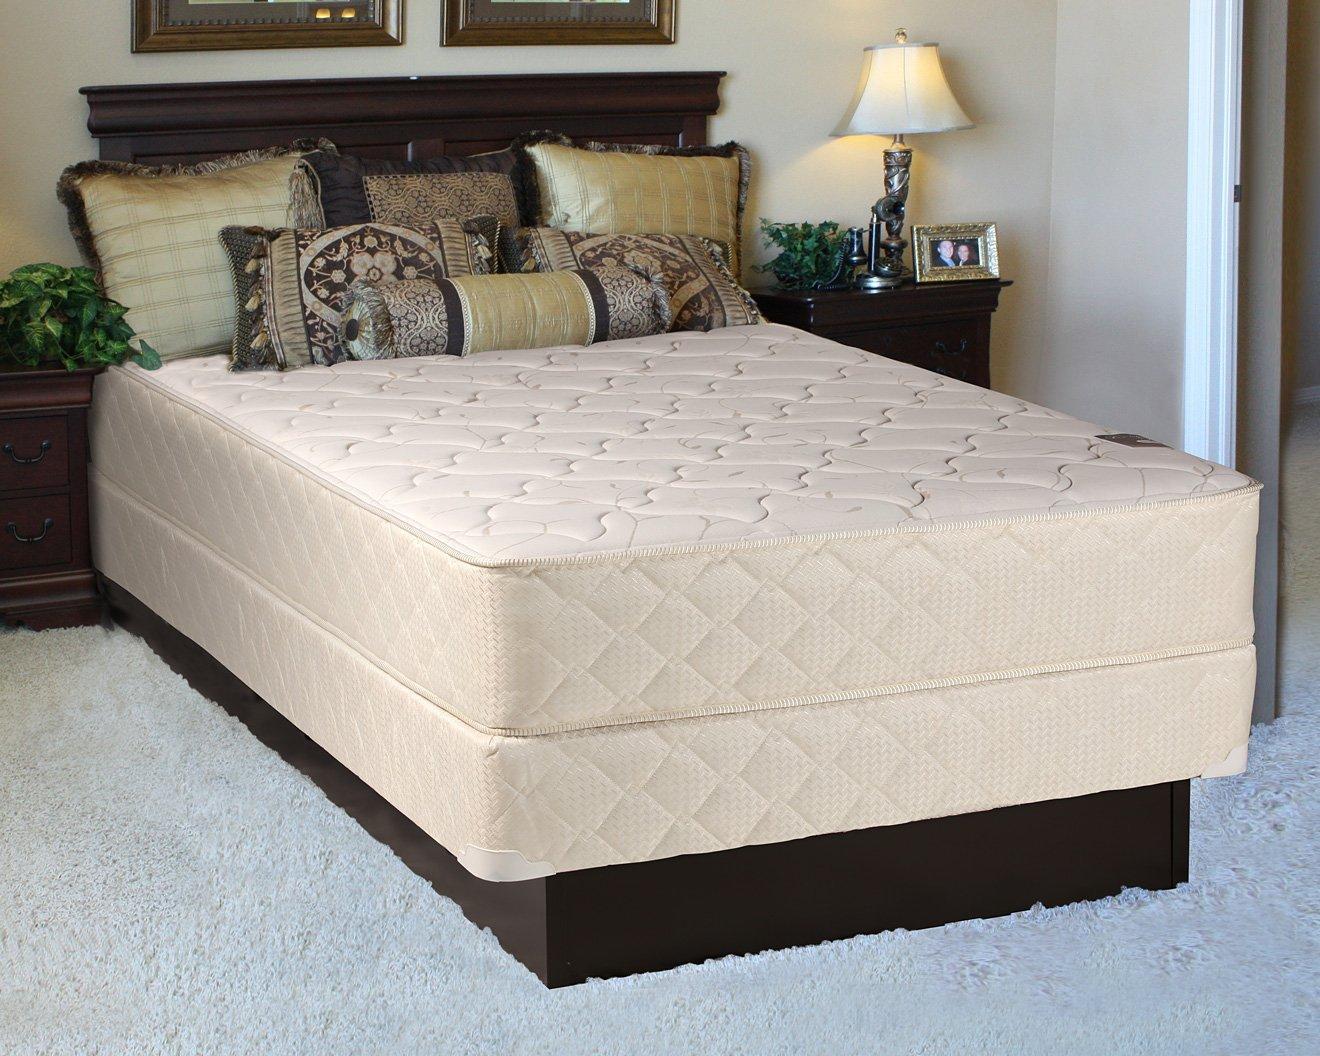 Comfort Rest Medium Firm Ny Mattress